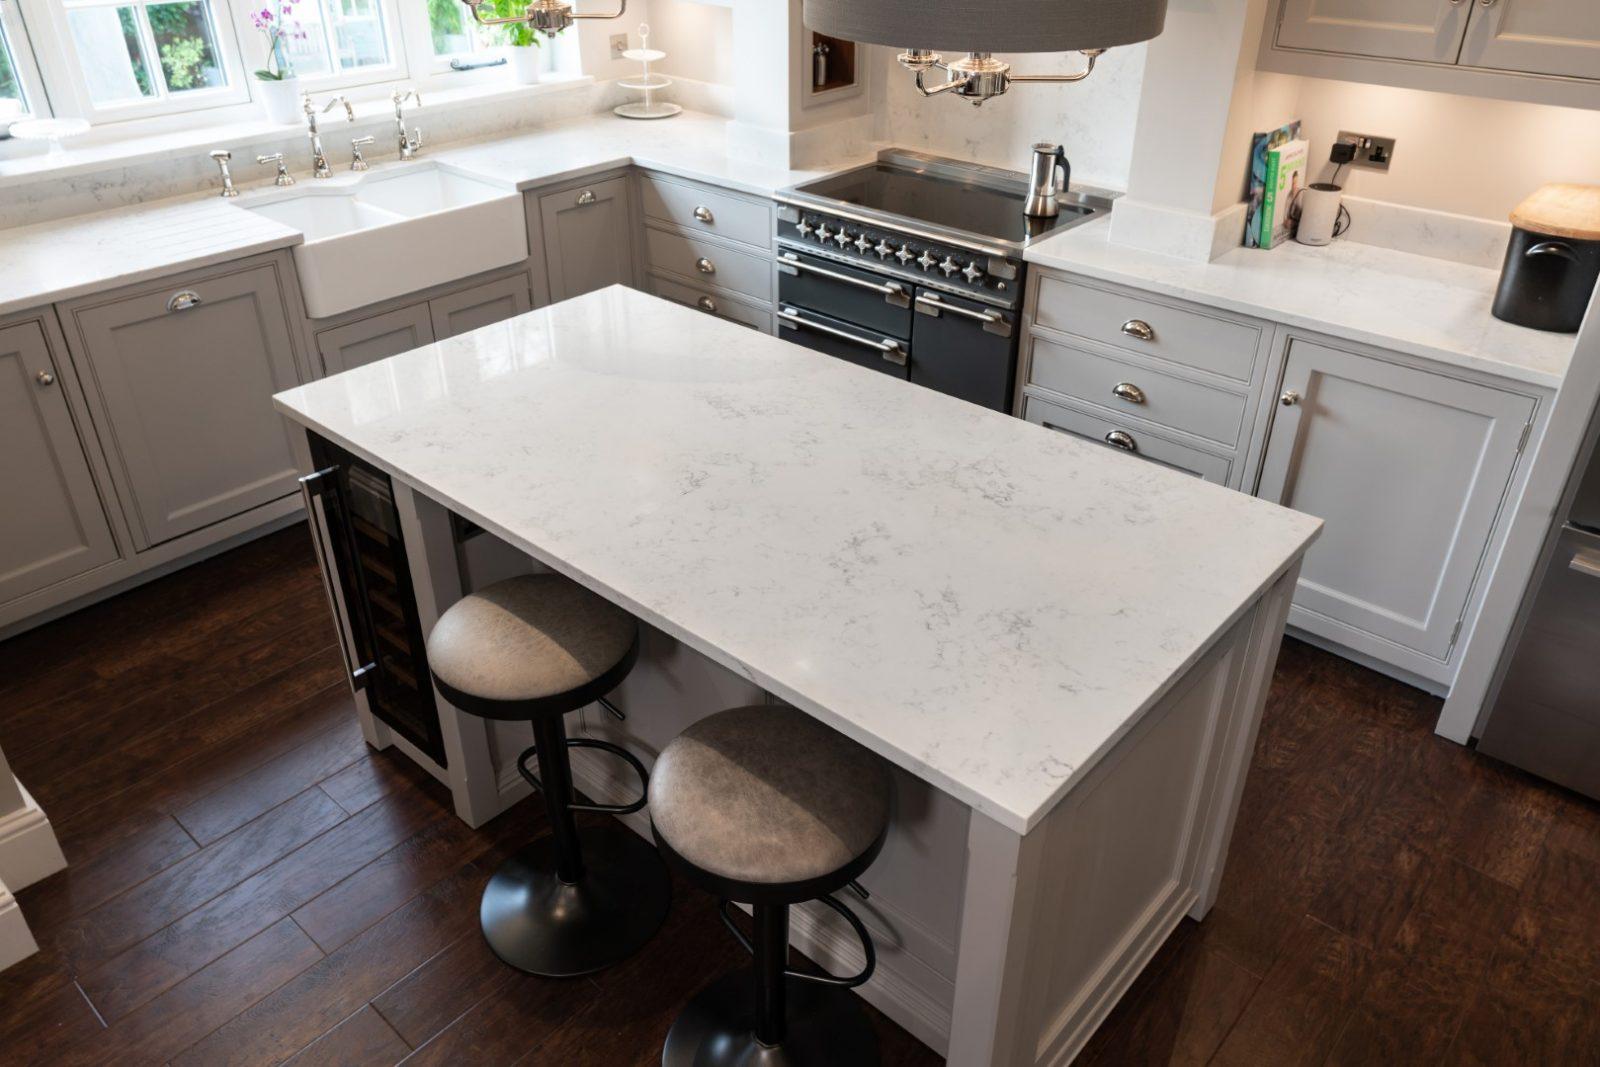 Kitchen of the week… Located in Widbury, Ware showcasing the Monaco Carrera